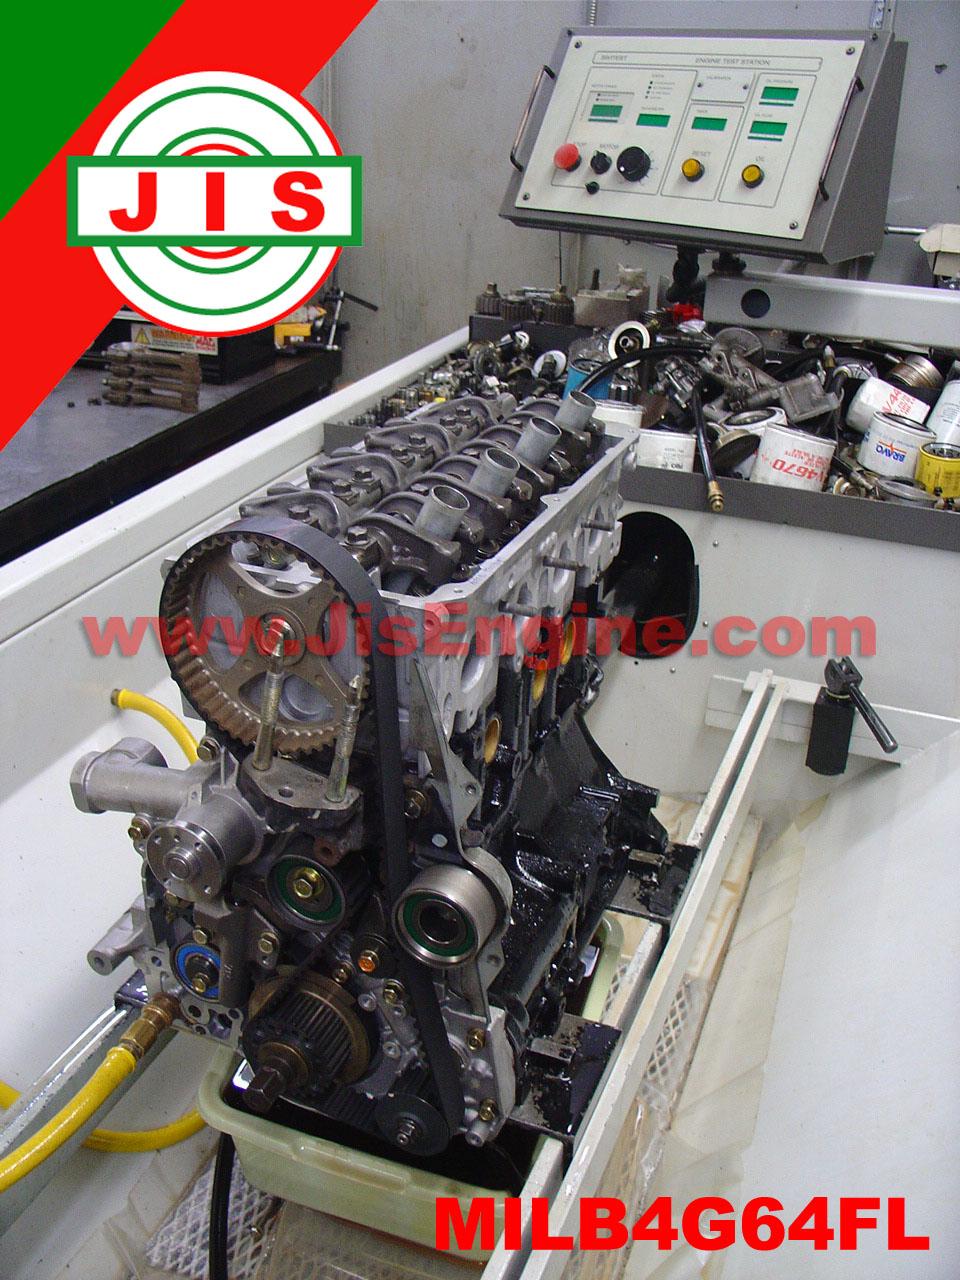 Mitsubishi Eclipse Engine Diagram Http Wwwjustanswercom Mitsubishi